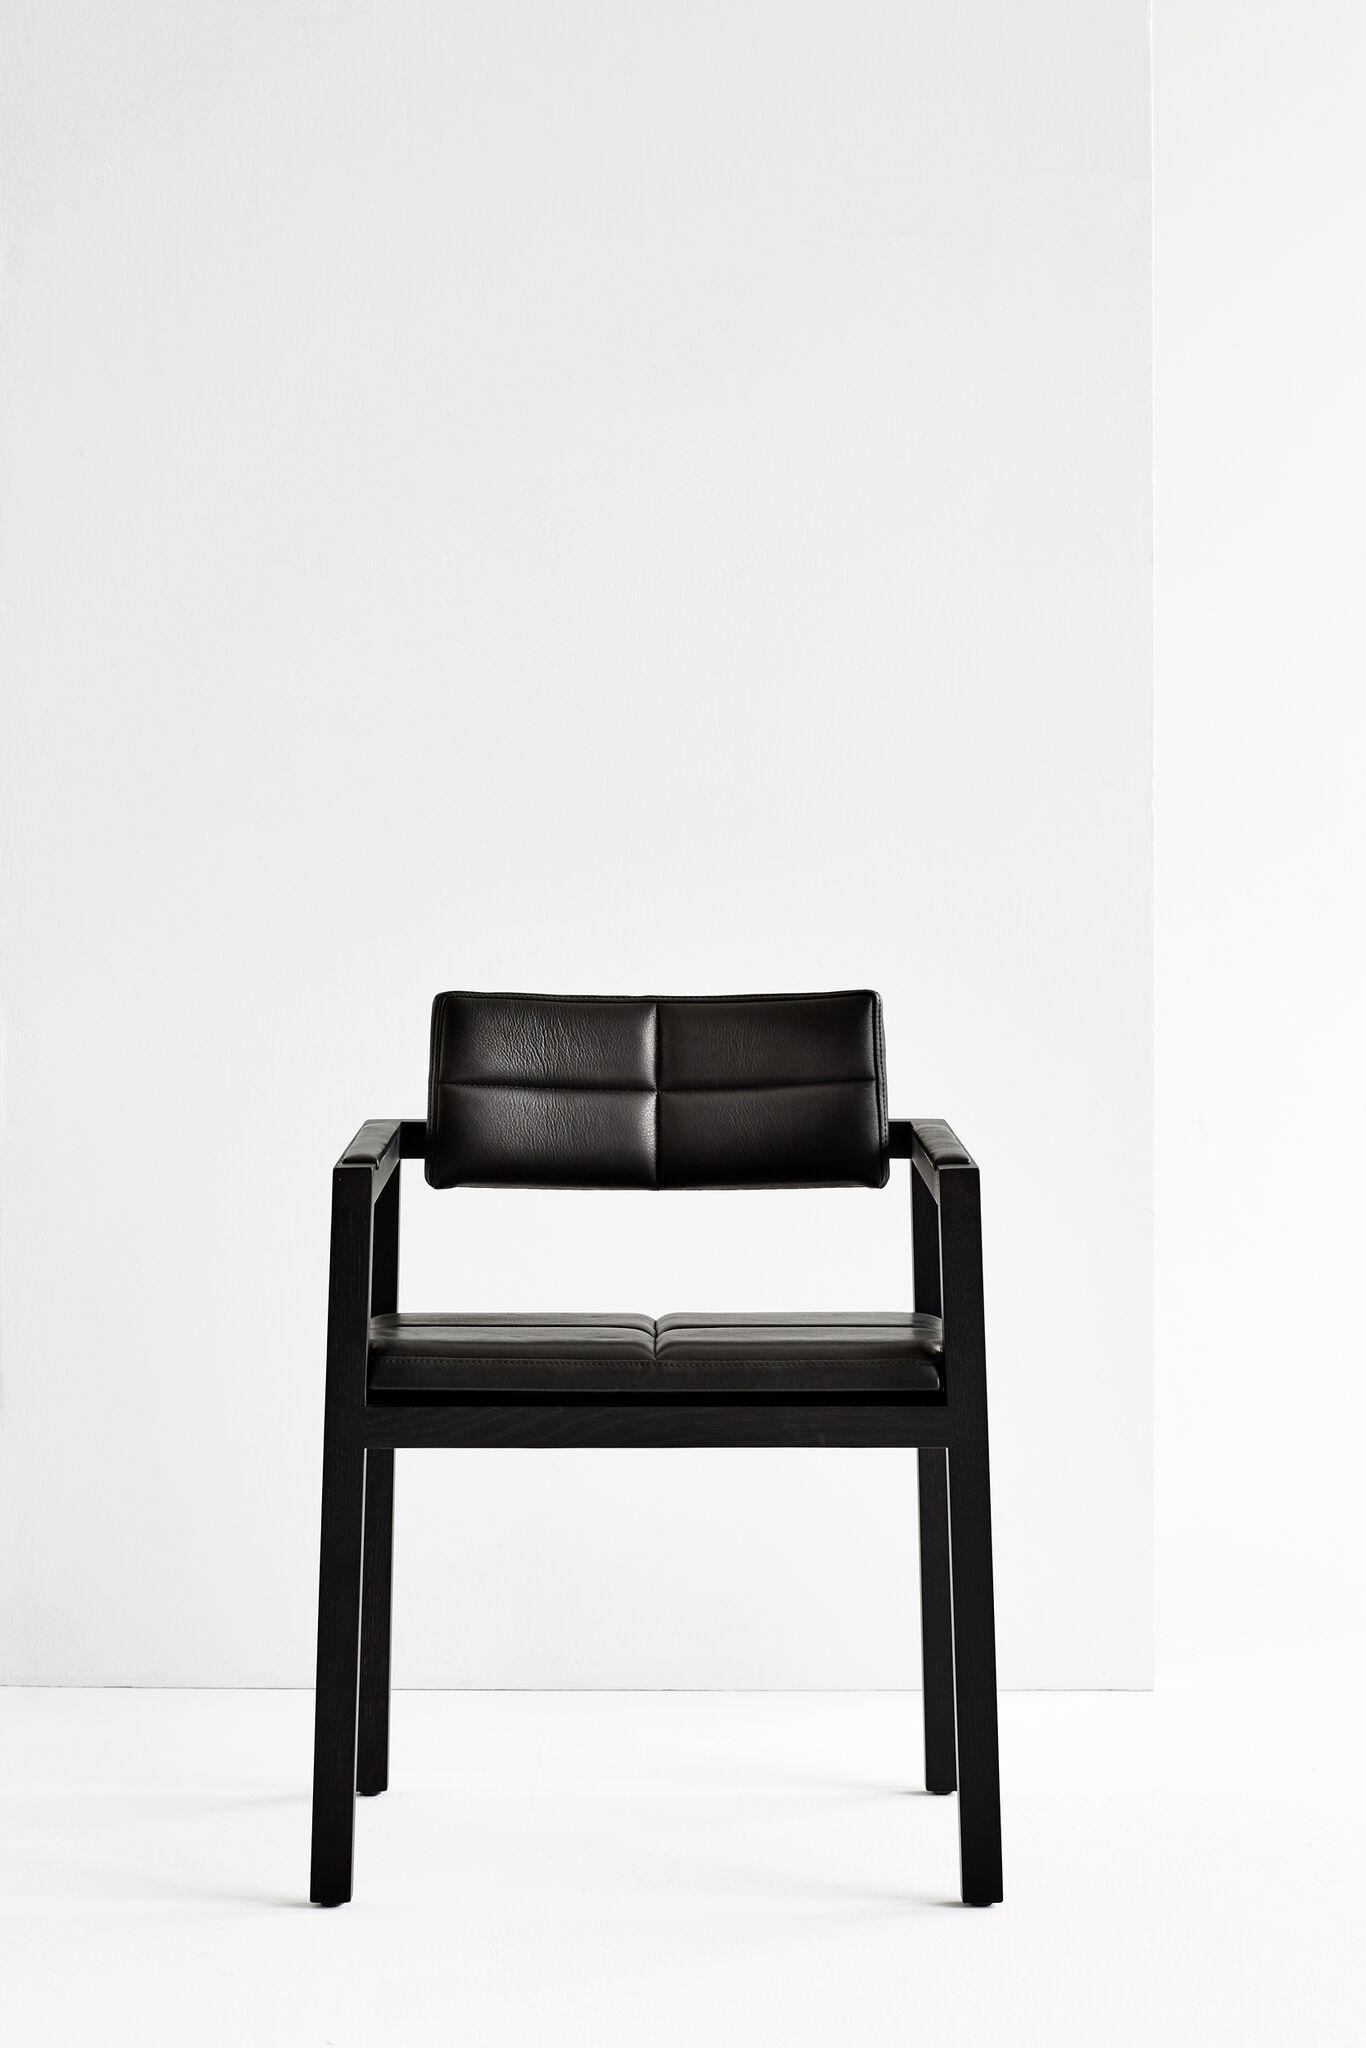 Gallery Of Mila Chair By Franco Crea Local Australian Furniture Designer & Maker Richmond, Melbourne Image 1